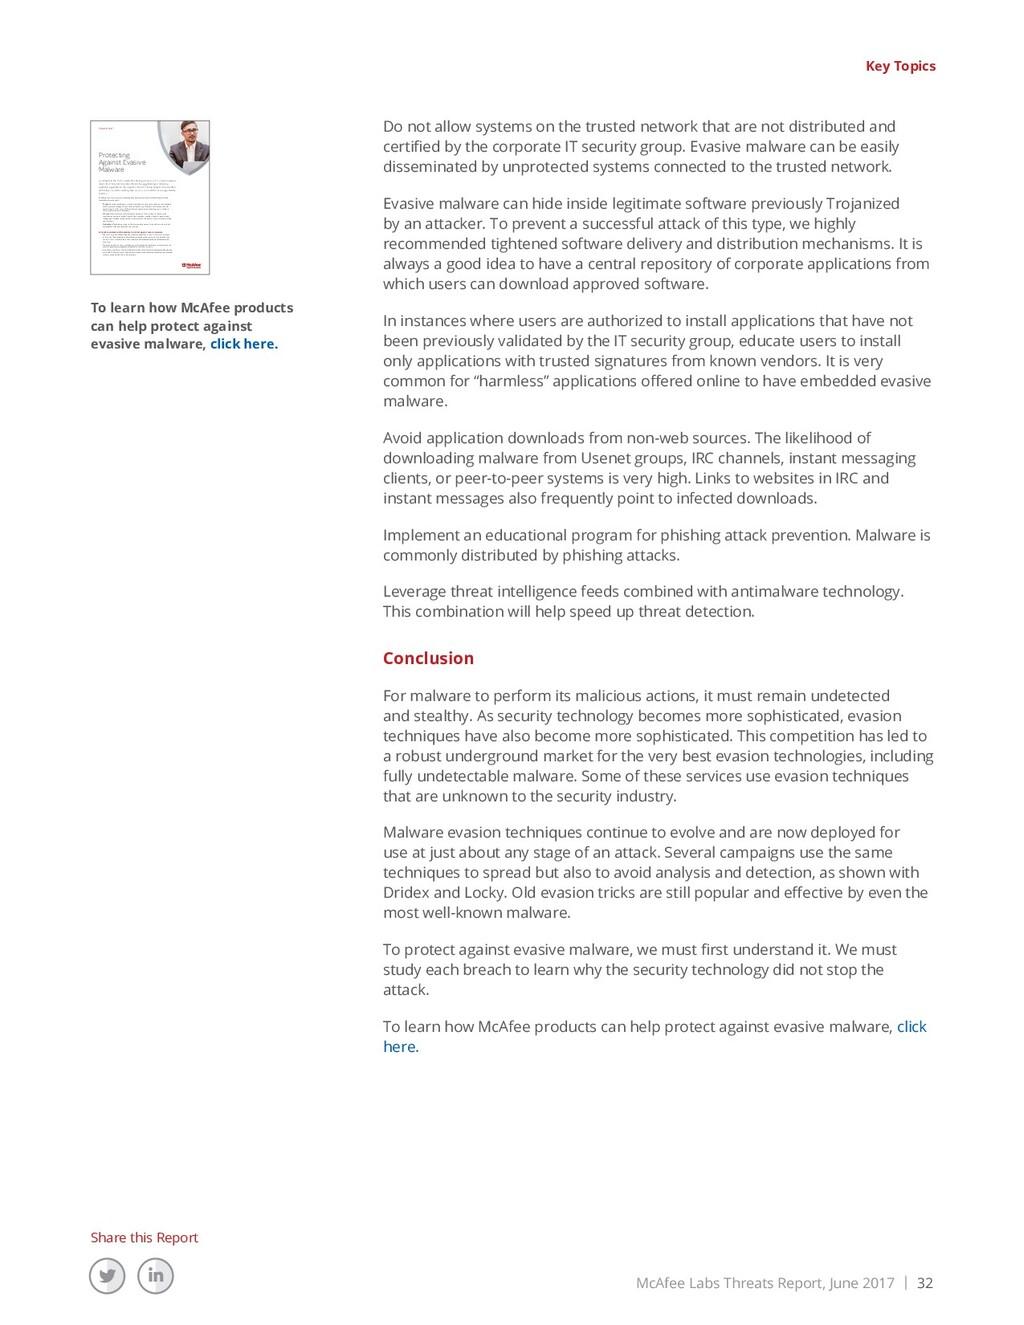 McAfee Labs Threats Report, June 2017 | 32 Shar...